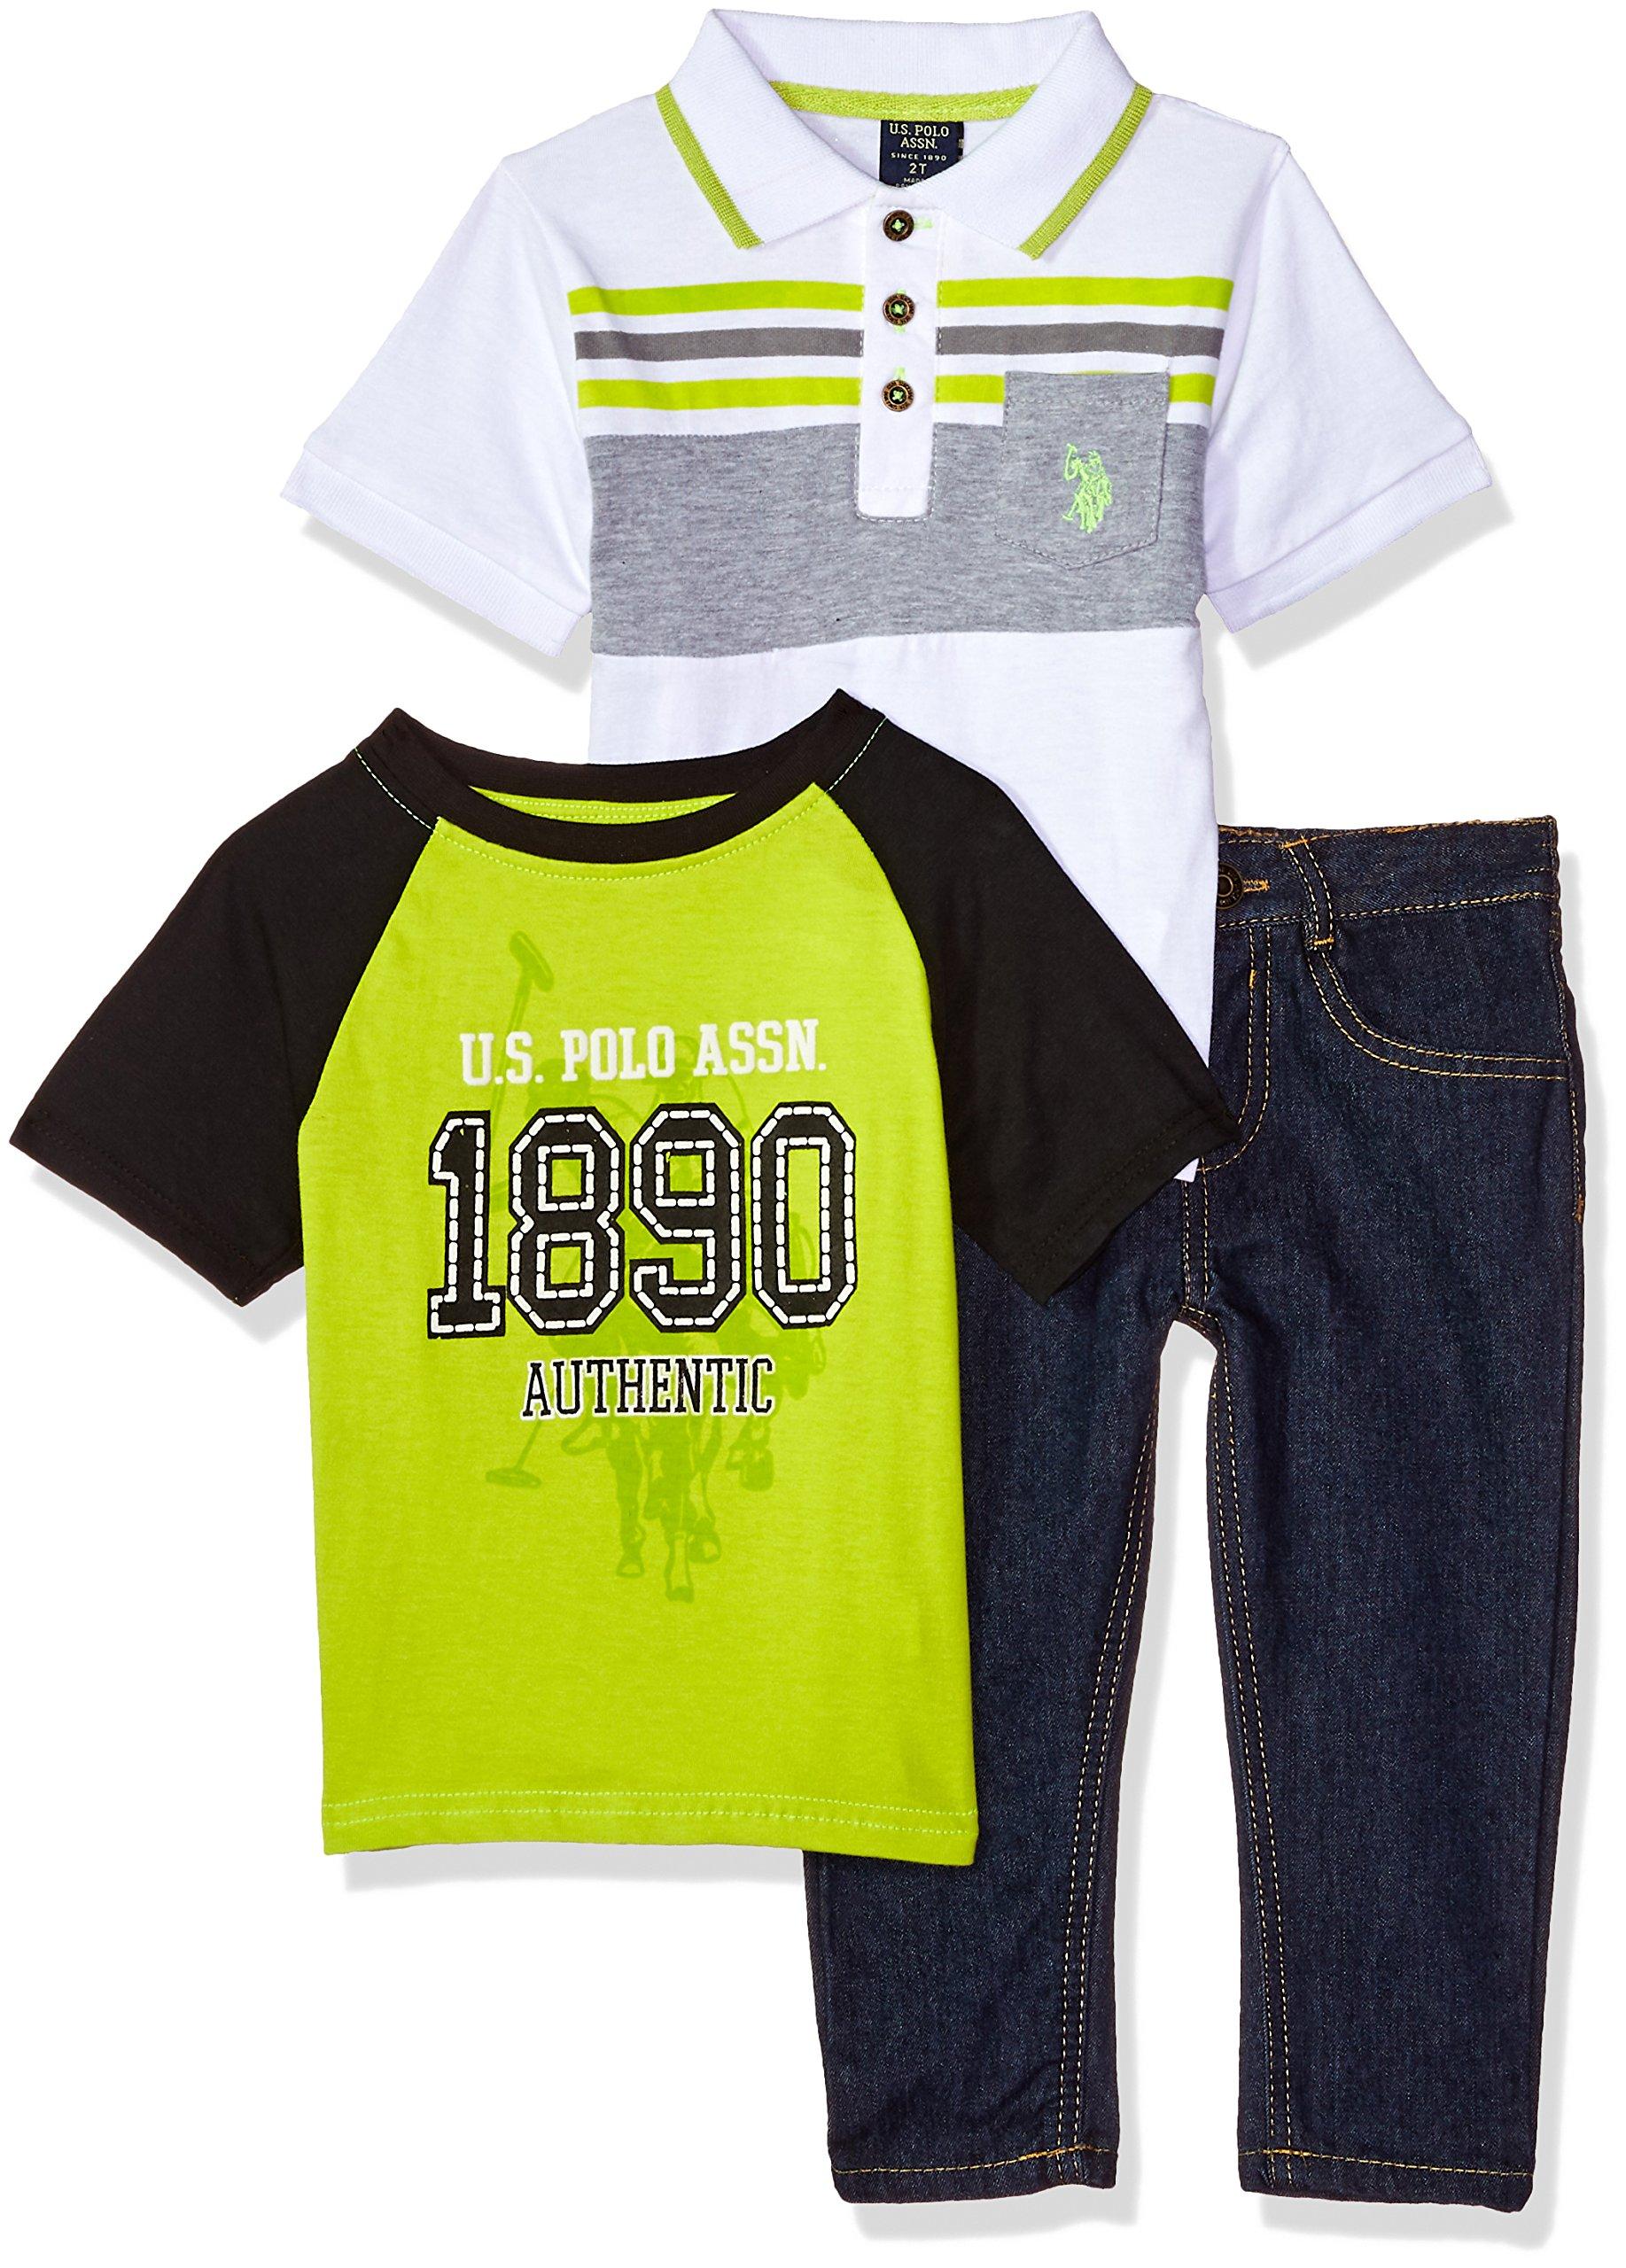 U.S. Polo Assn. Boys' Toddler, T-Shirt and Pant Set, neon Jersey el top Lime, 4T